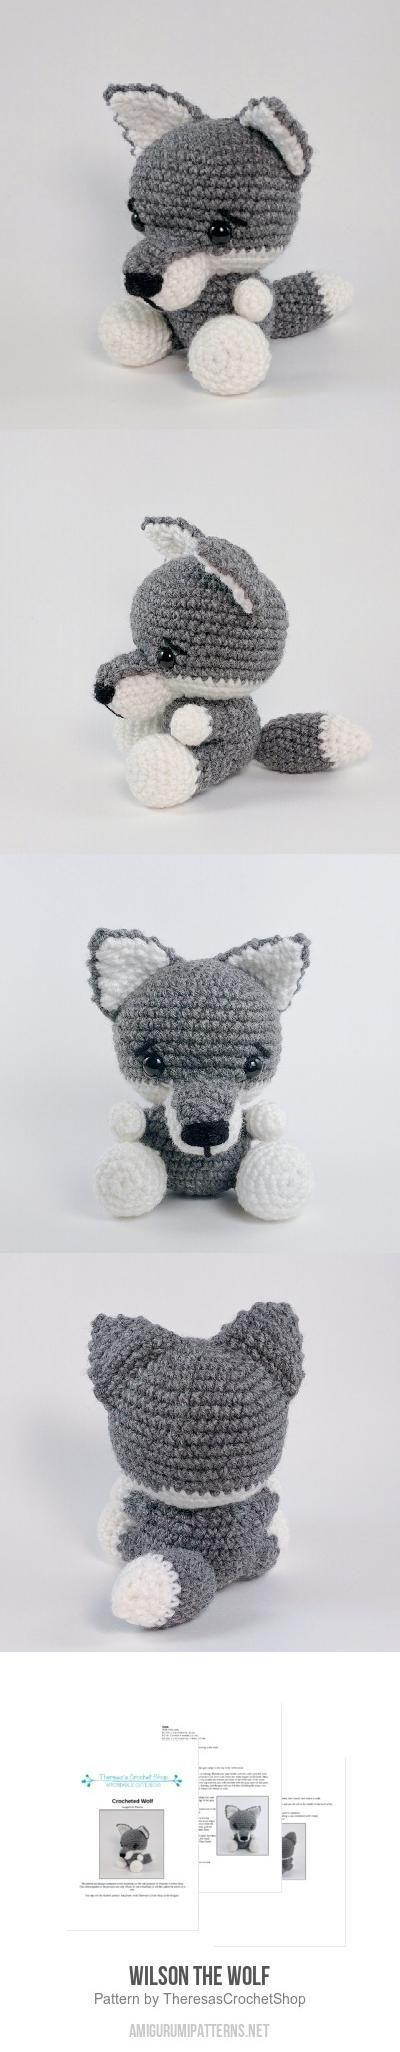 Wilson the Wolf amigurumi pattern by Theresas Crochet Shop ...